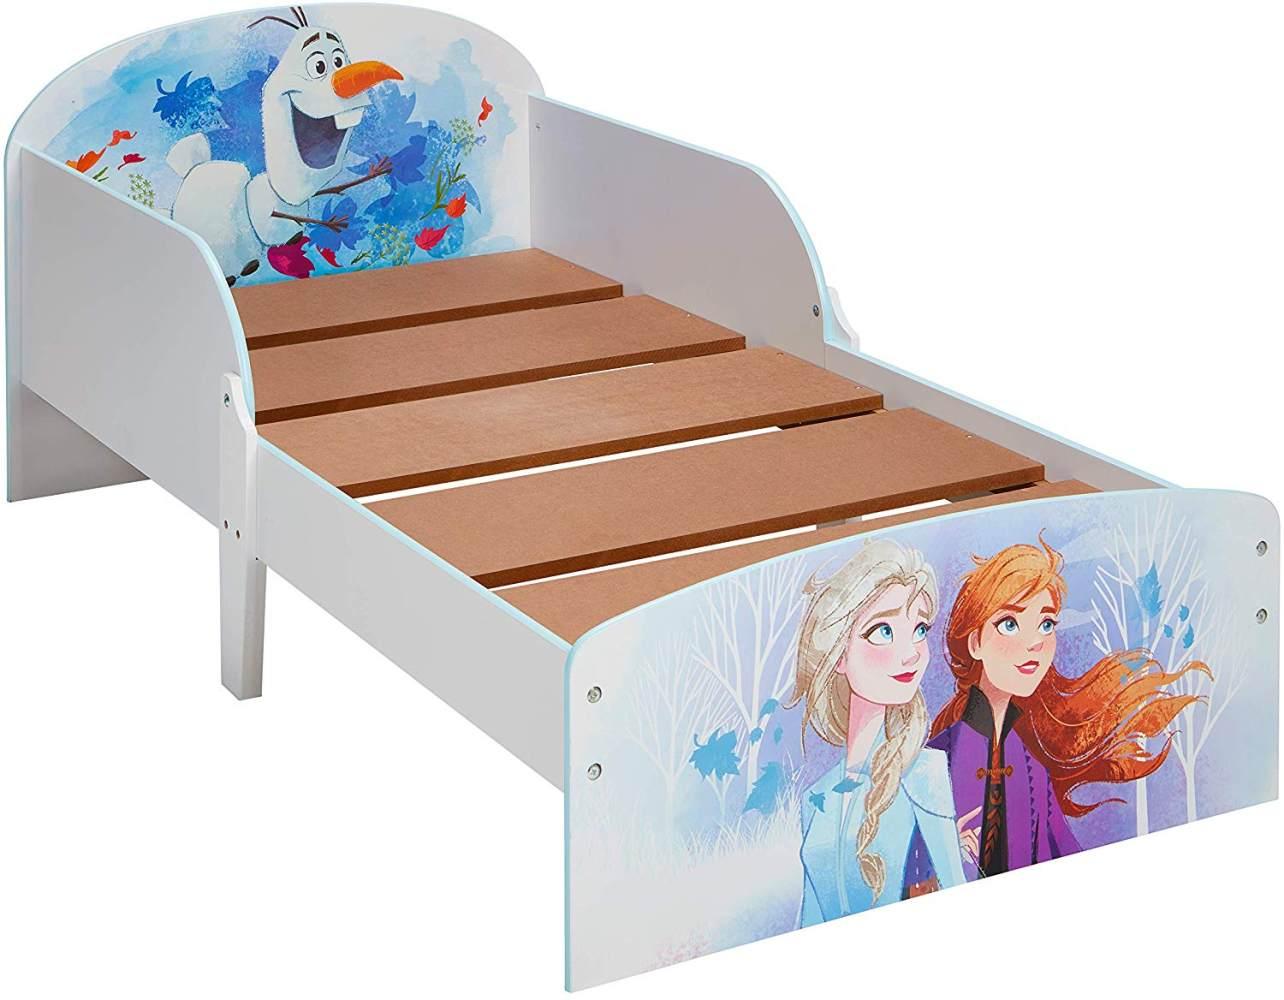 Moose Toys 'Frozen' Kinderbett inkl. Stoffschubladen 70x140 Bild 1